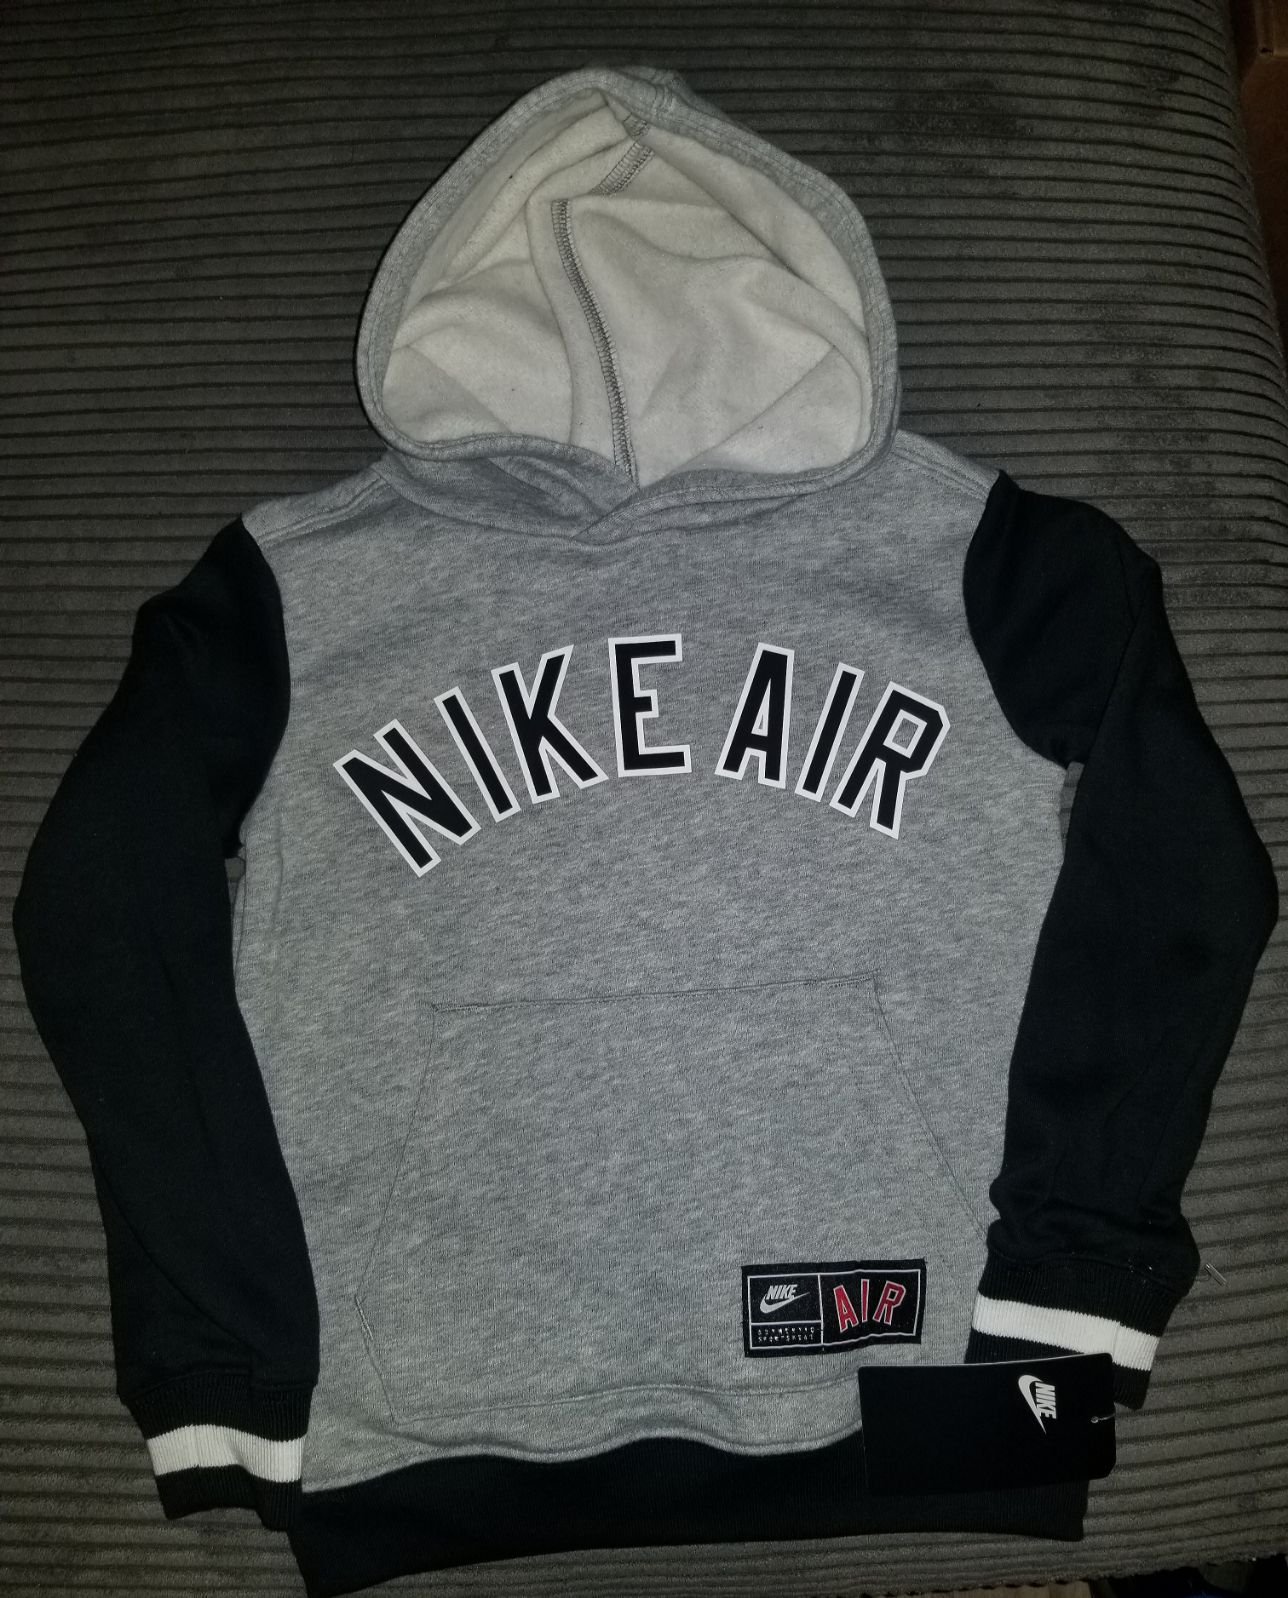 Nike Air Boys/youth Hoodie XS